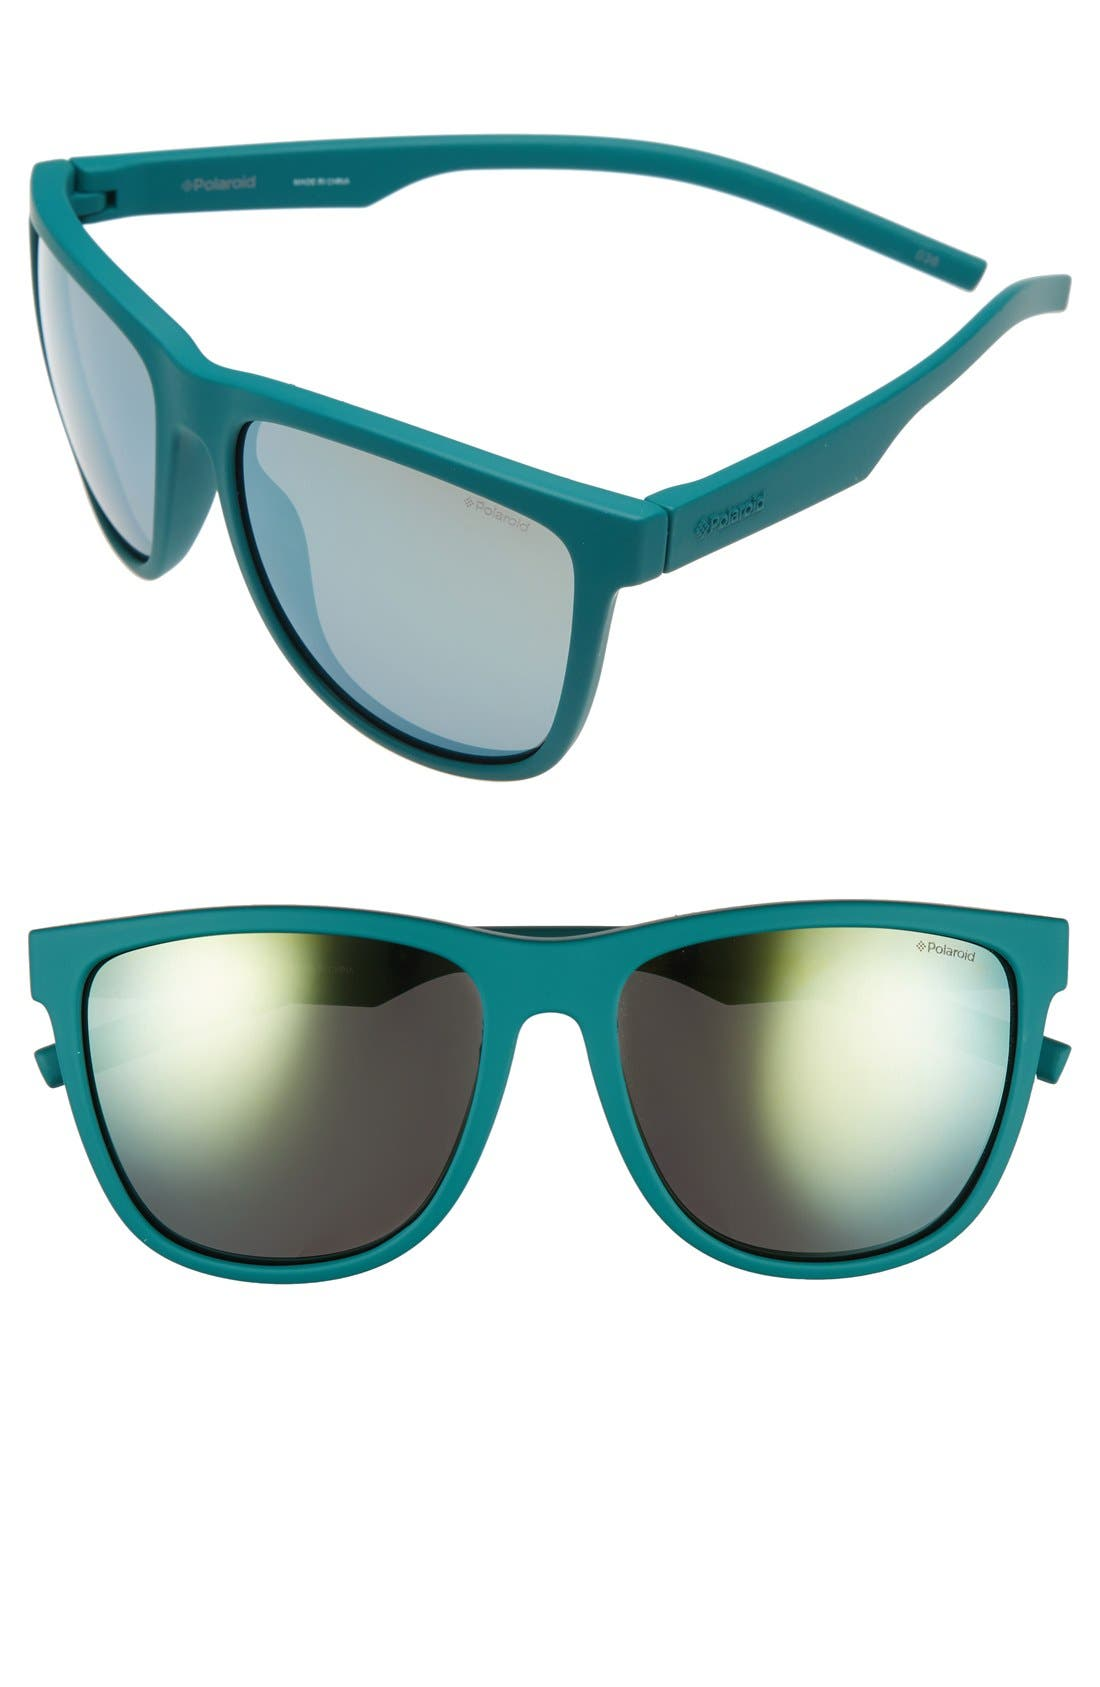 Polaroid 56mm Retro Polarized Sunglasses,                         Main,                         color, GREEN/ GREY GOLD MIRROR